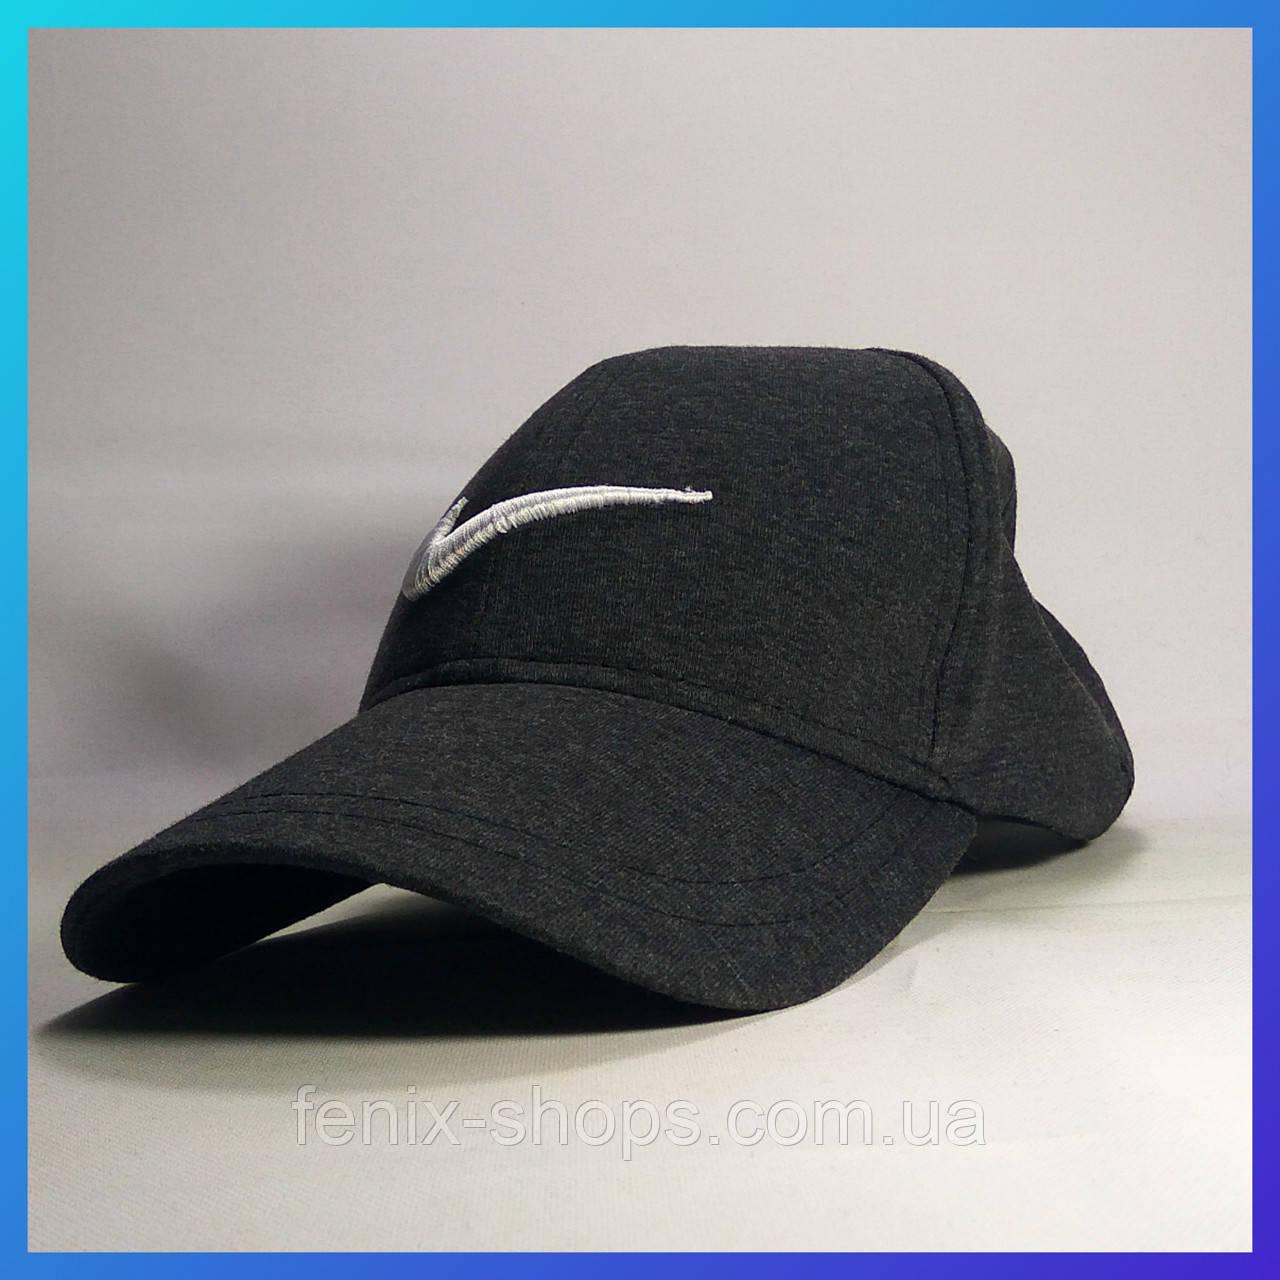 82b5df89 Кепка Nike бейсболка Найк, цена 200 грн., купить в Одессе — Prom.ua ...